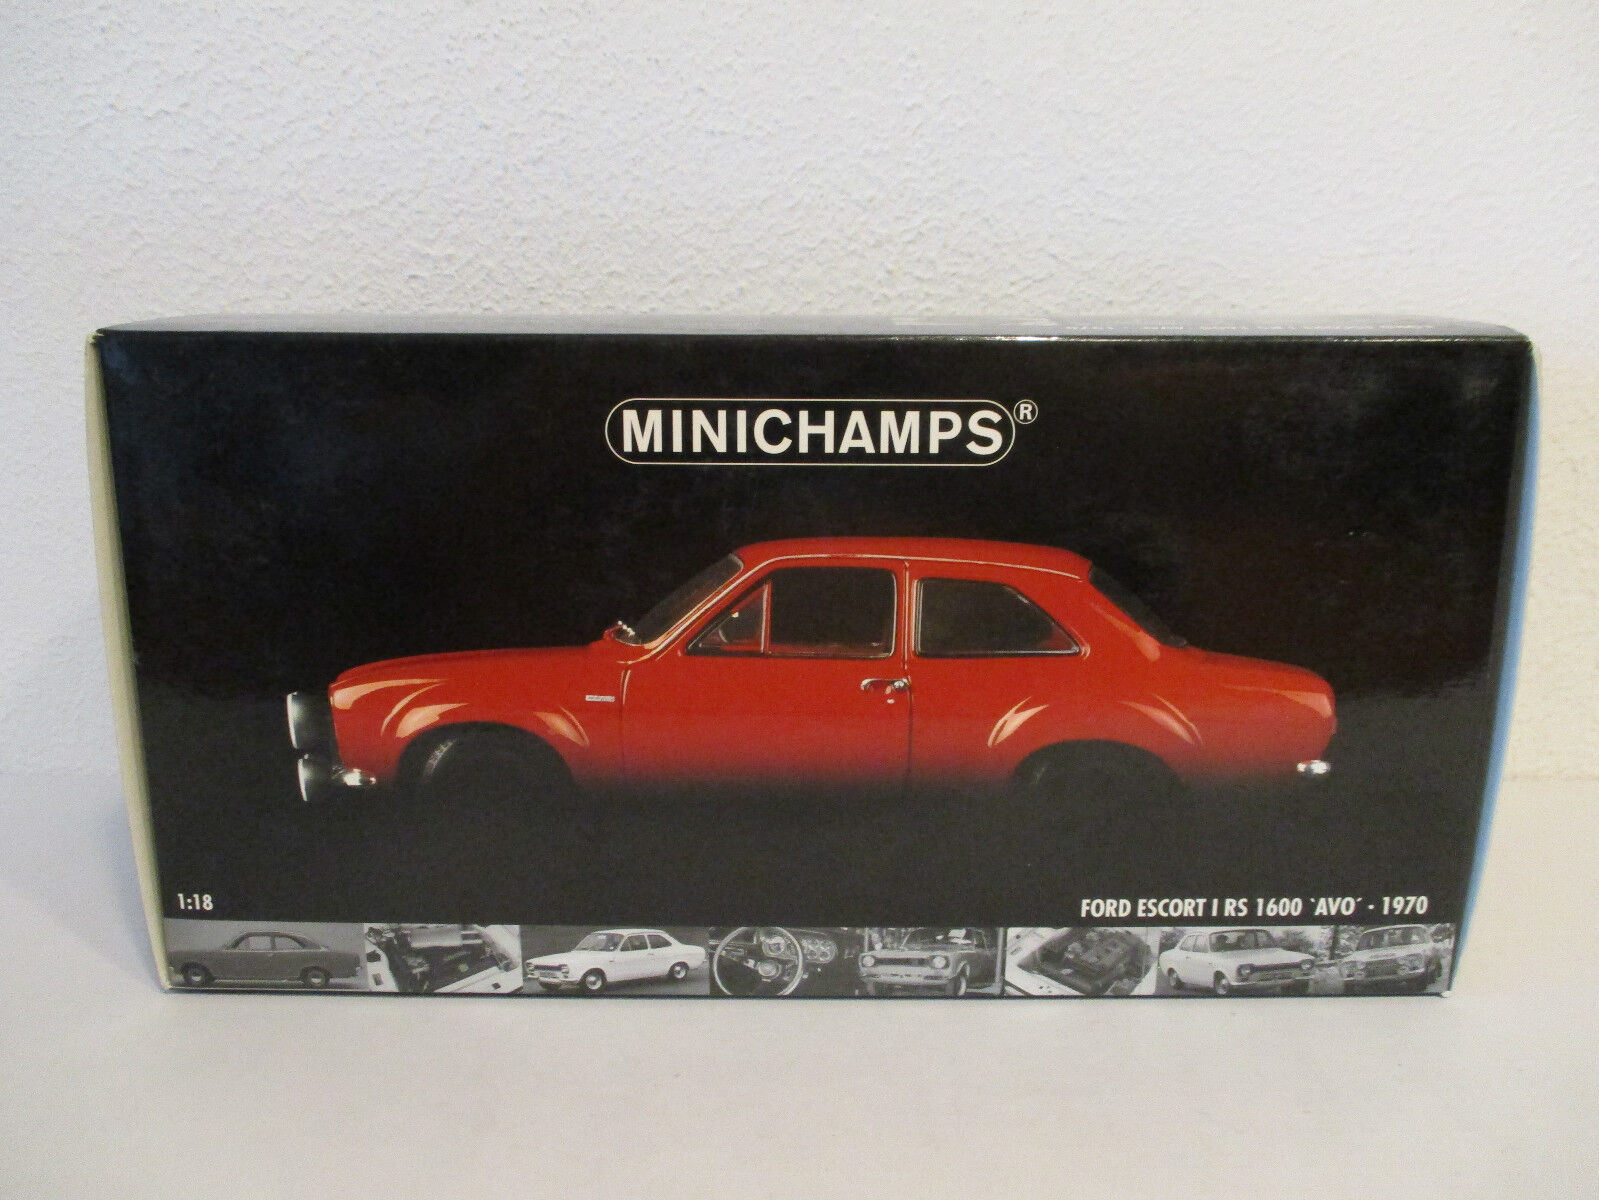 ( Gol ) 1 18 Minichamps Ford Escort I RS 1600 AVO 1970 nuevo emb. orig.